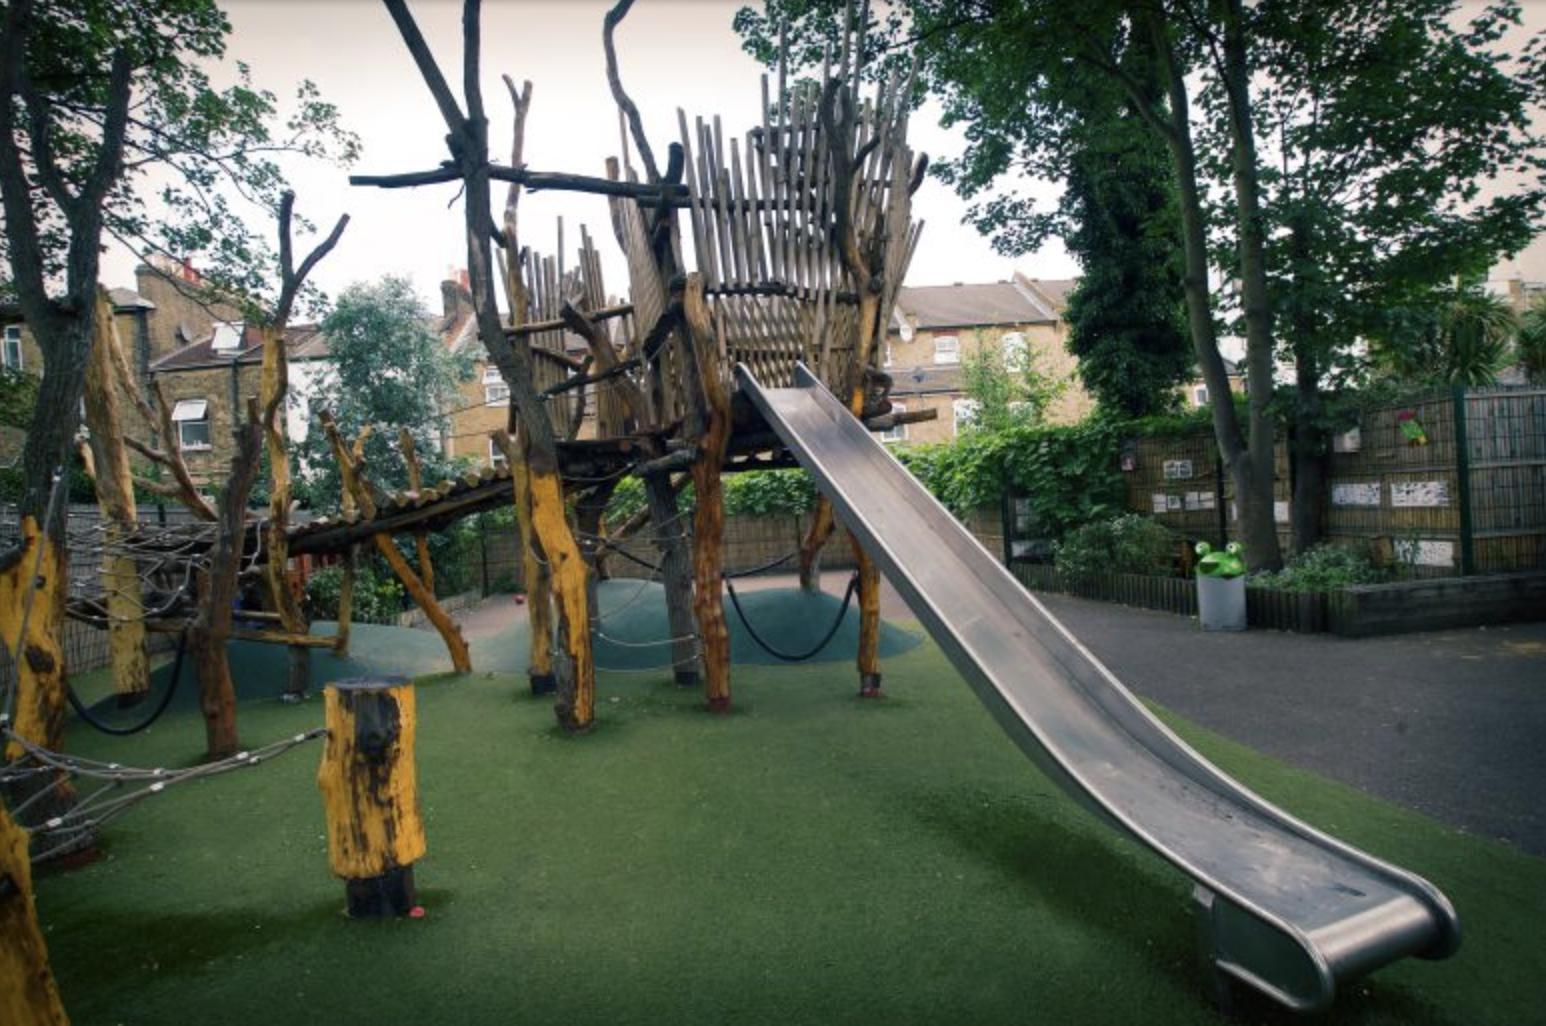 Erect's innovative playground at Columbia Primary School